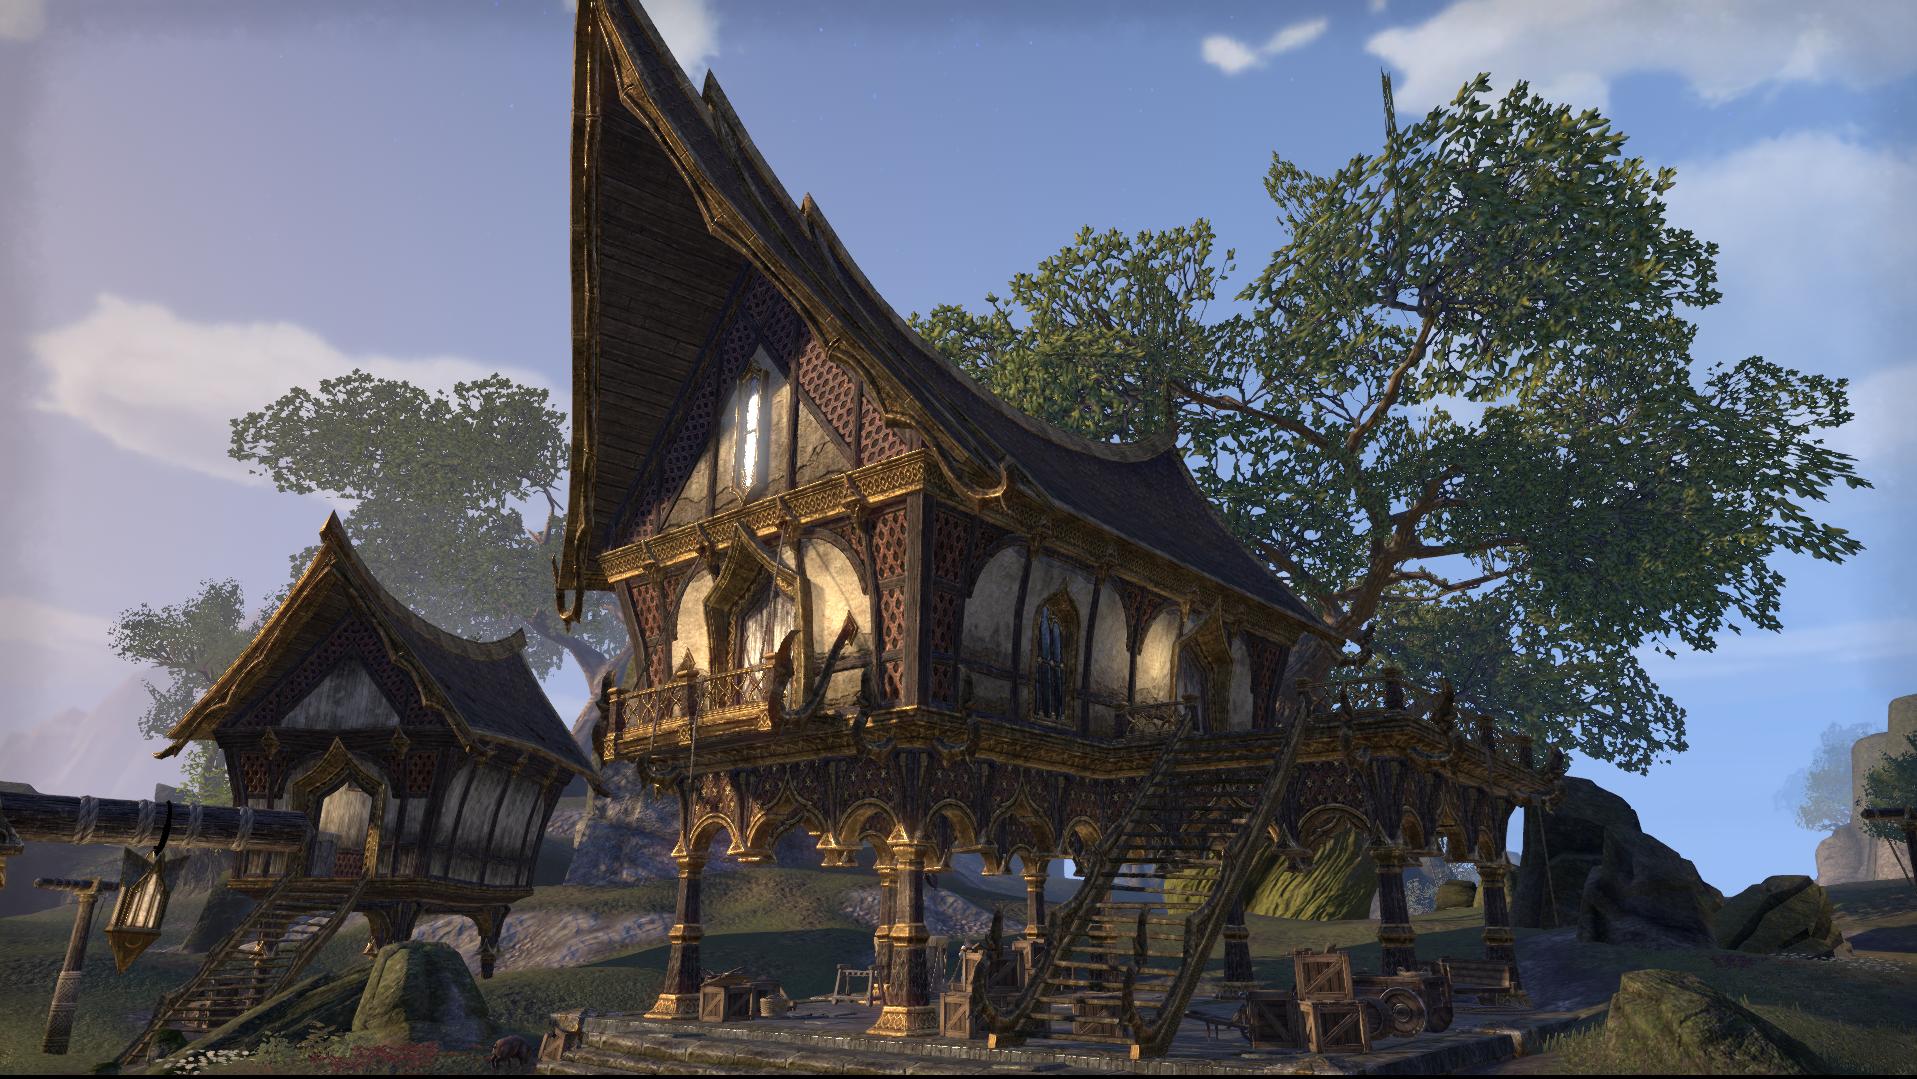 Juranda-ra's House